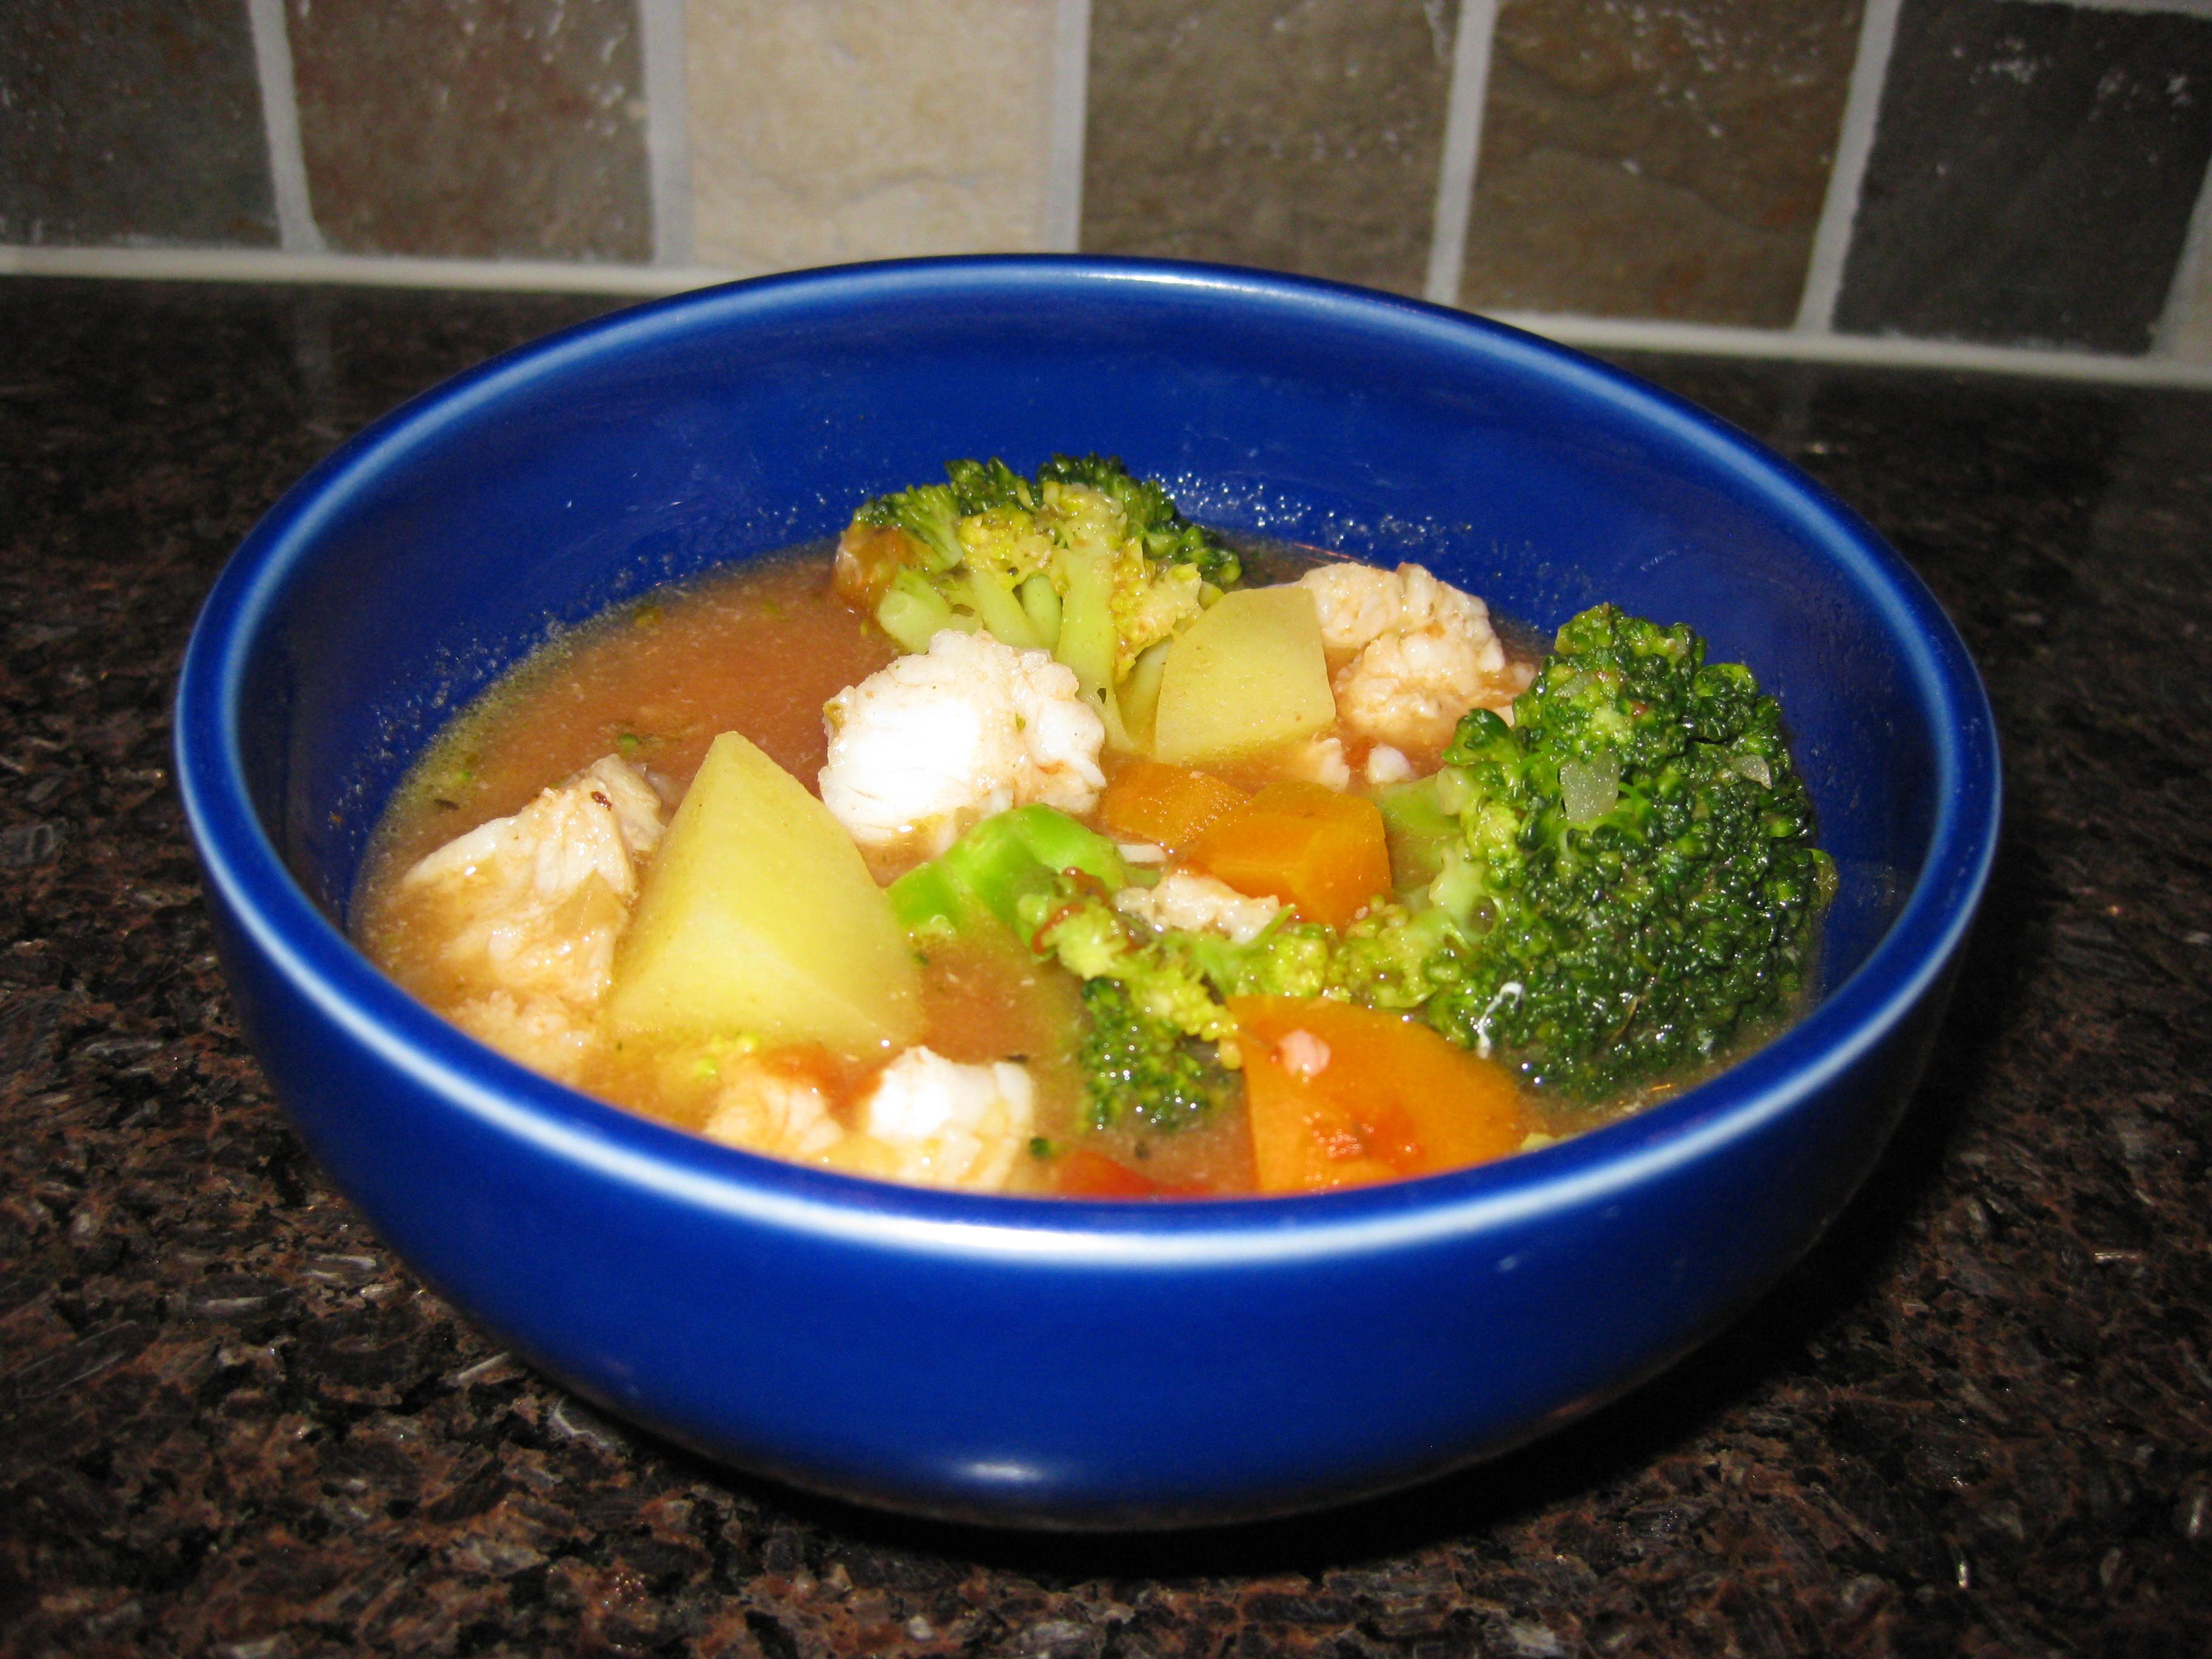 broccoli torsk i ugn